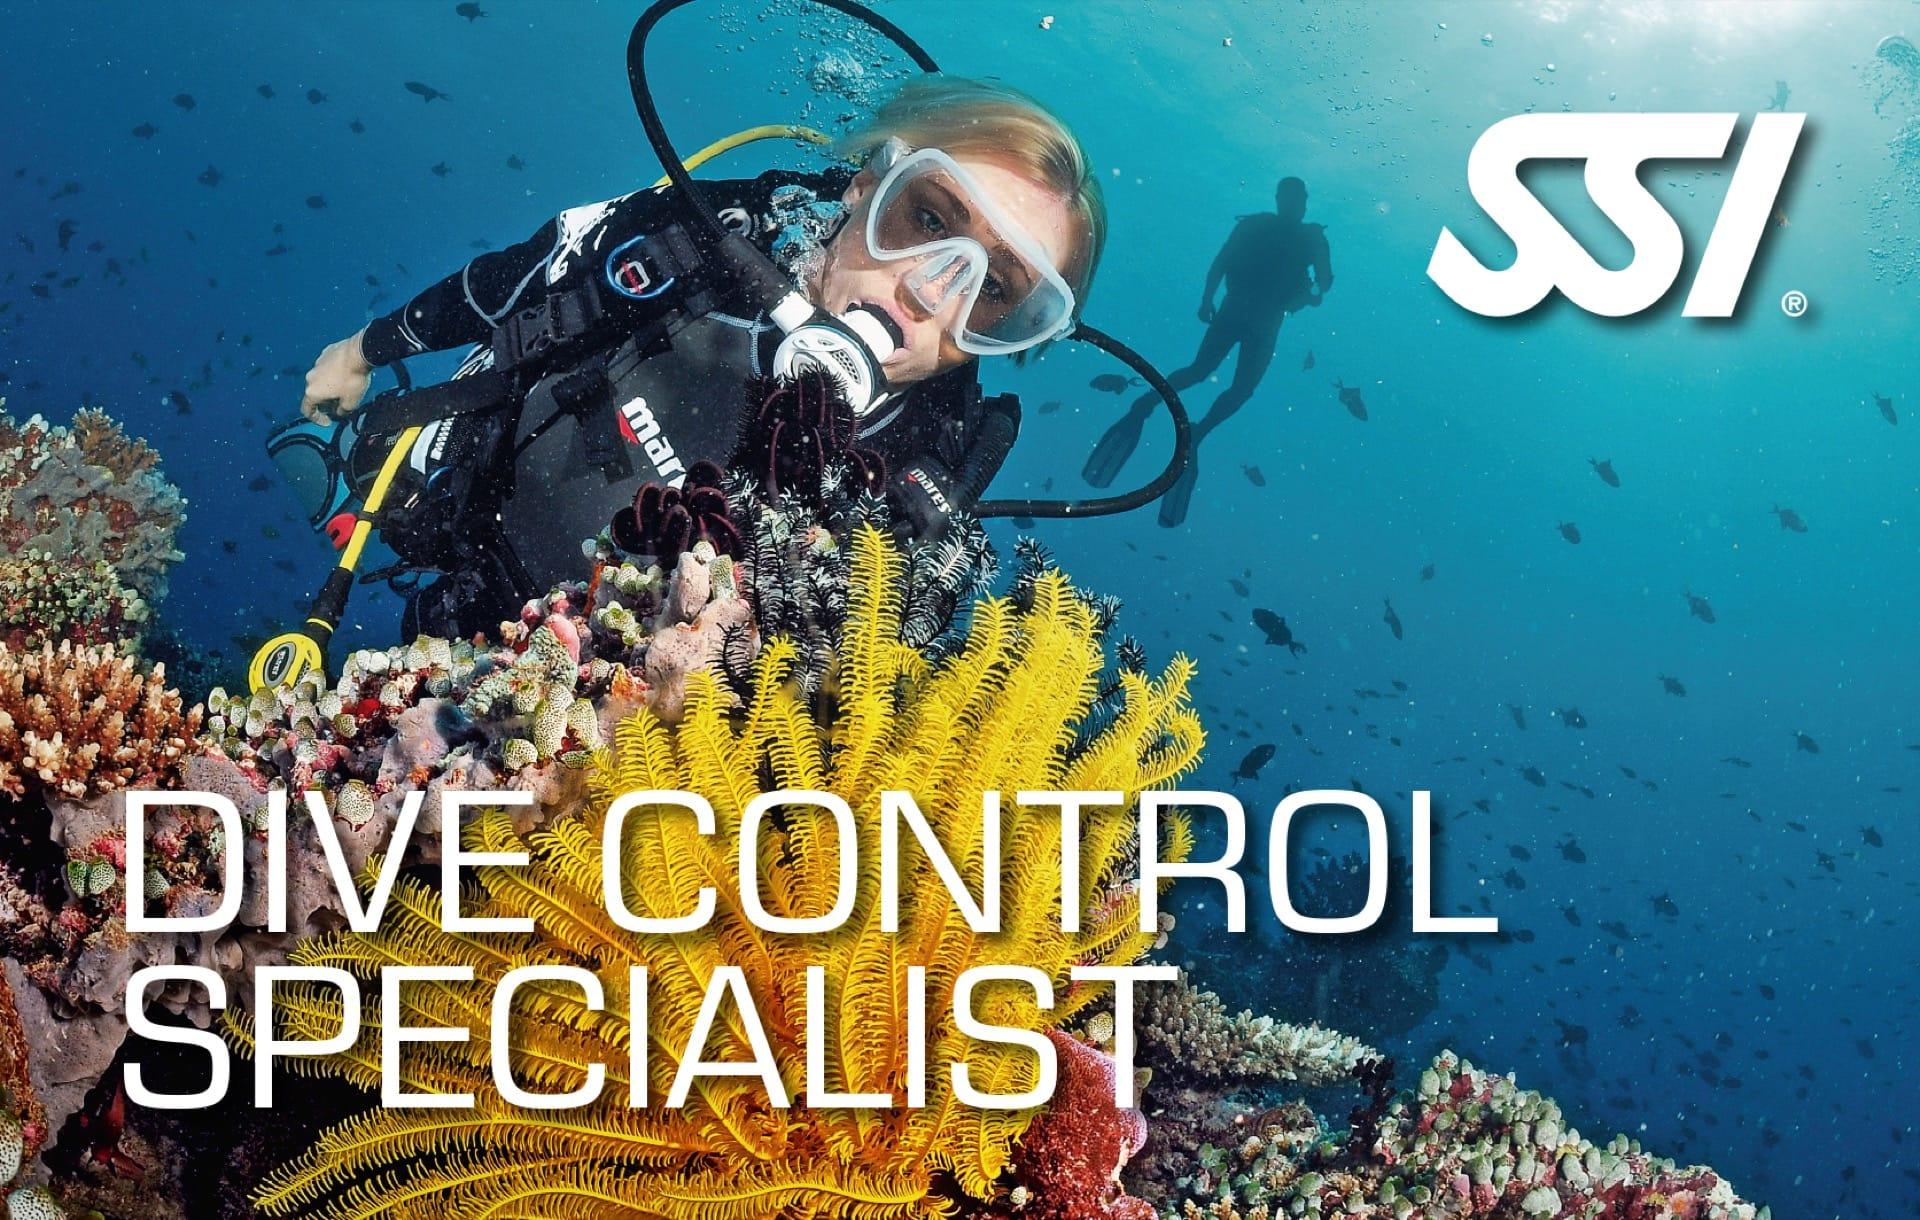 SSI Dive Control Specialist Course | SSI Dive Control Specialist | Dive Control Specialist | Diving Course